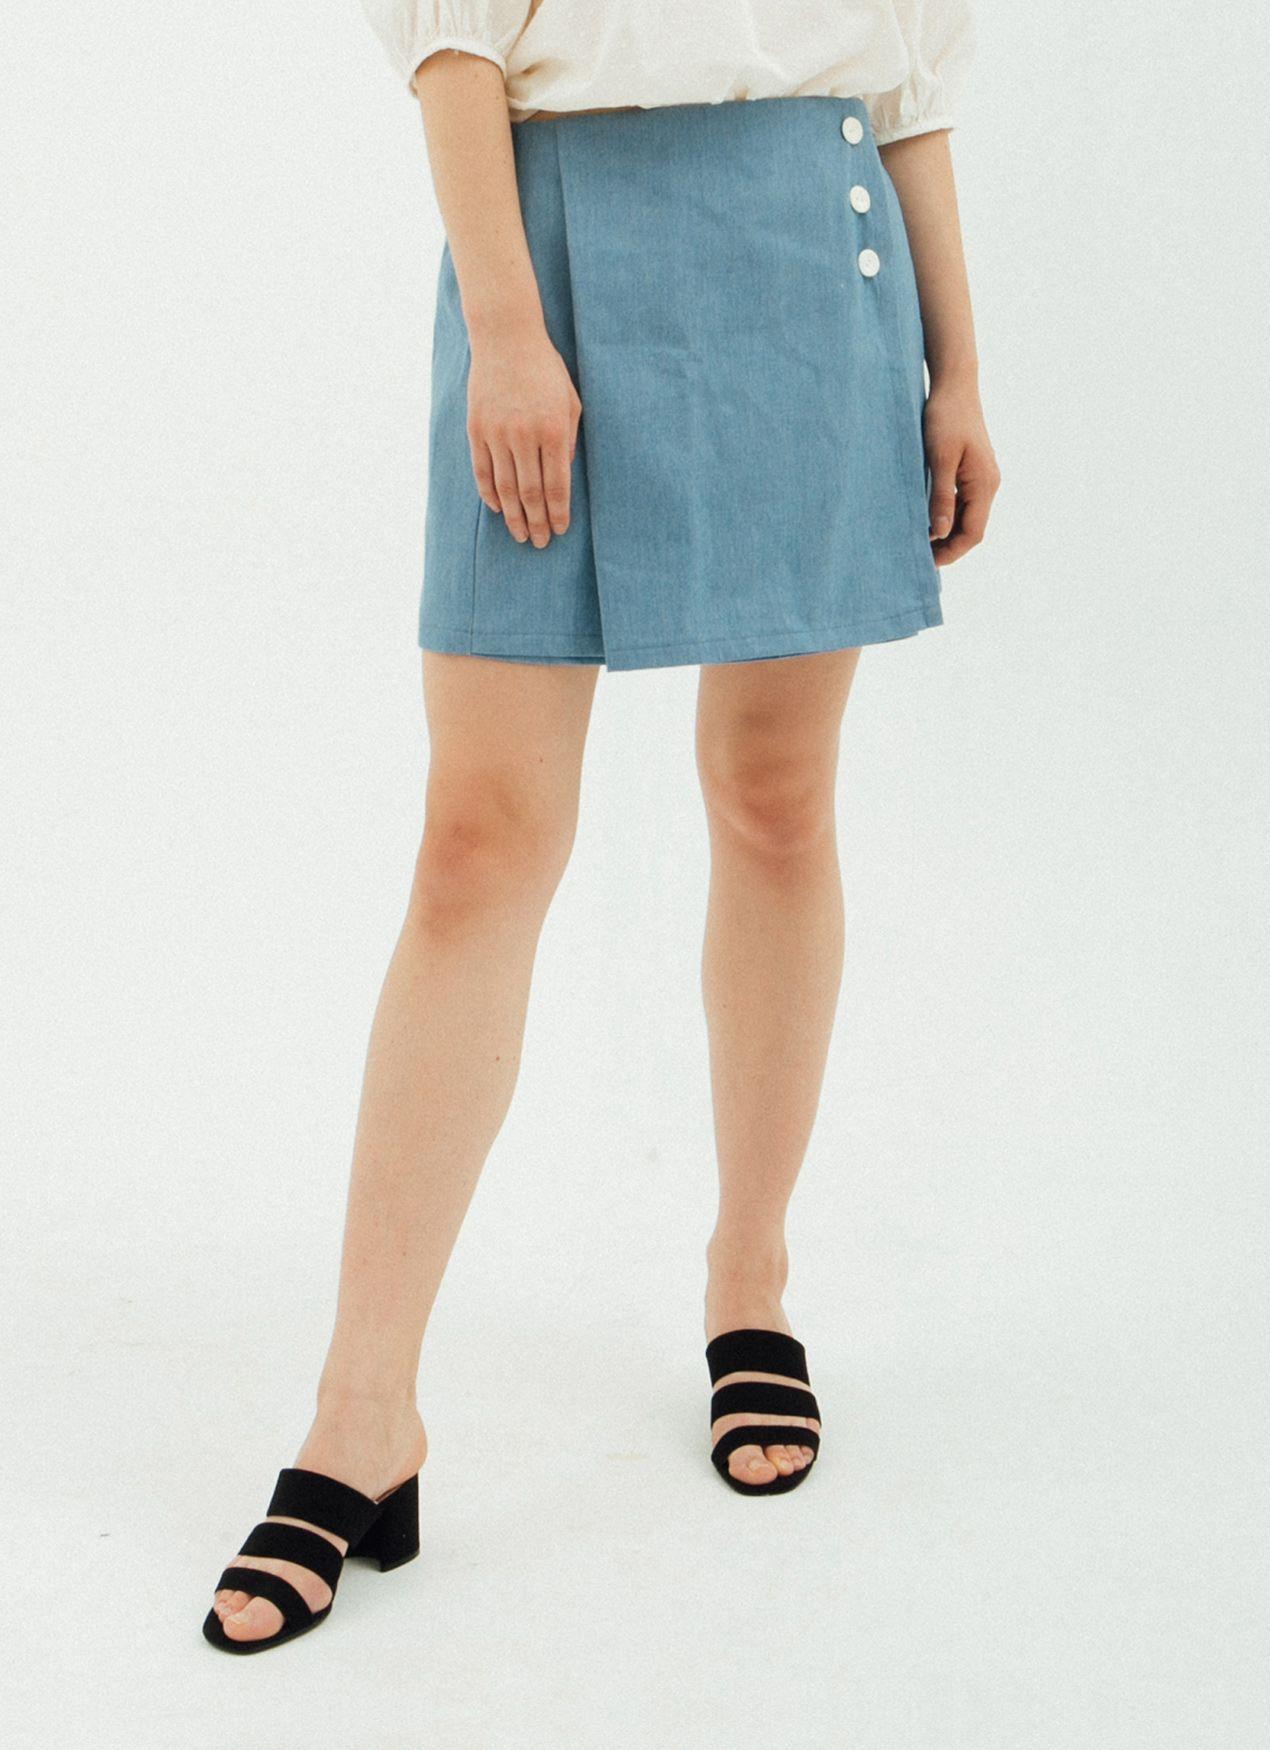 Bahas Brand Lokal: Rok Mini yang Super Chic!